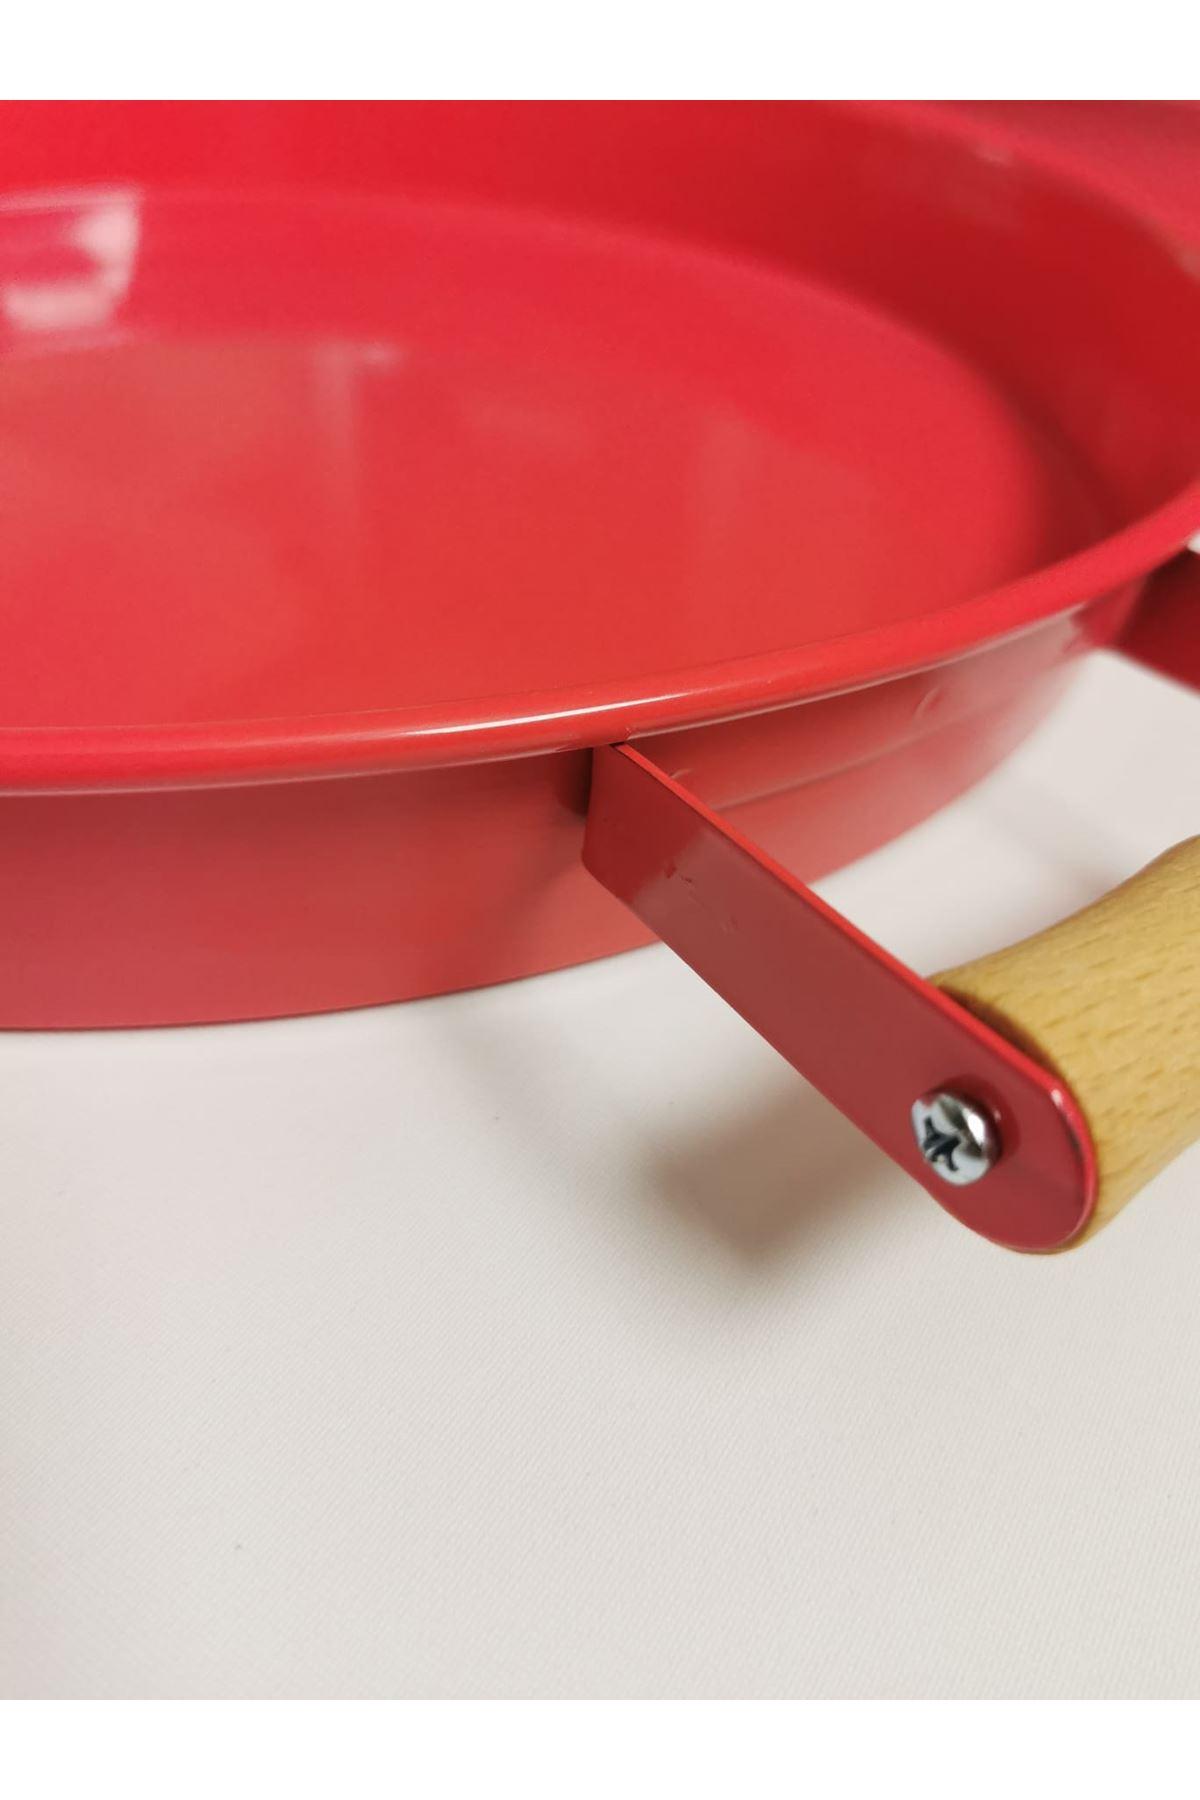 Kitchen Trend 37 Cm Ahşap Kulplu Metal Yuvarlak Pembe Tepsi Sunum Tepsi, Kahvaltı Tepsisi